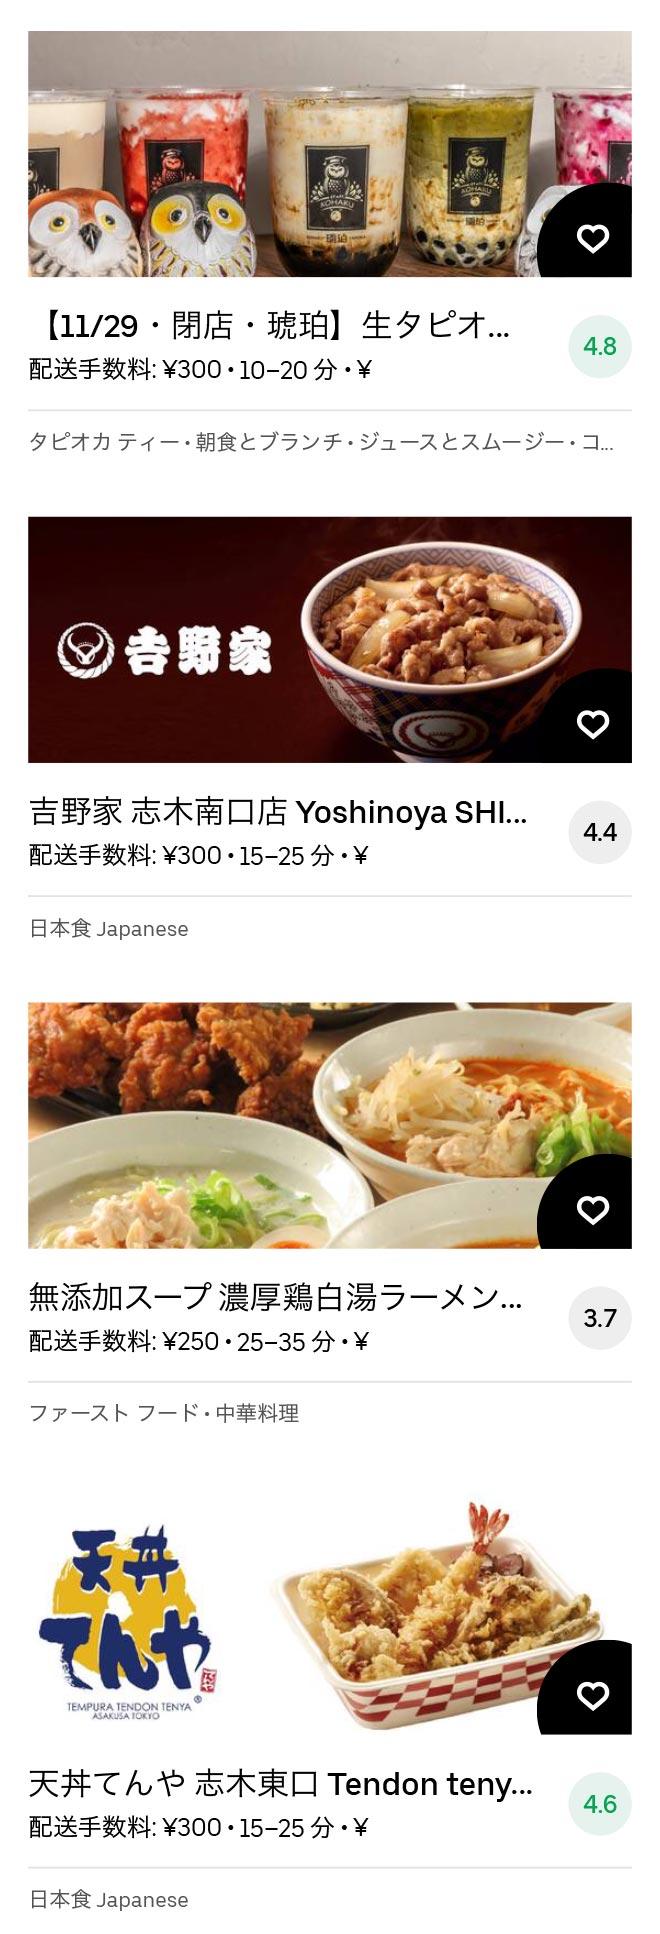 Yanasegawa menu 2011 07